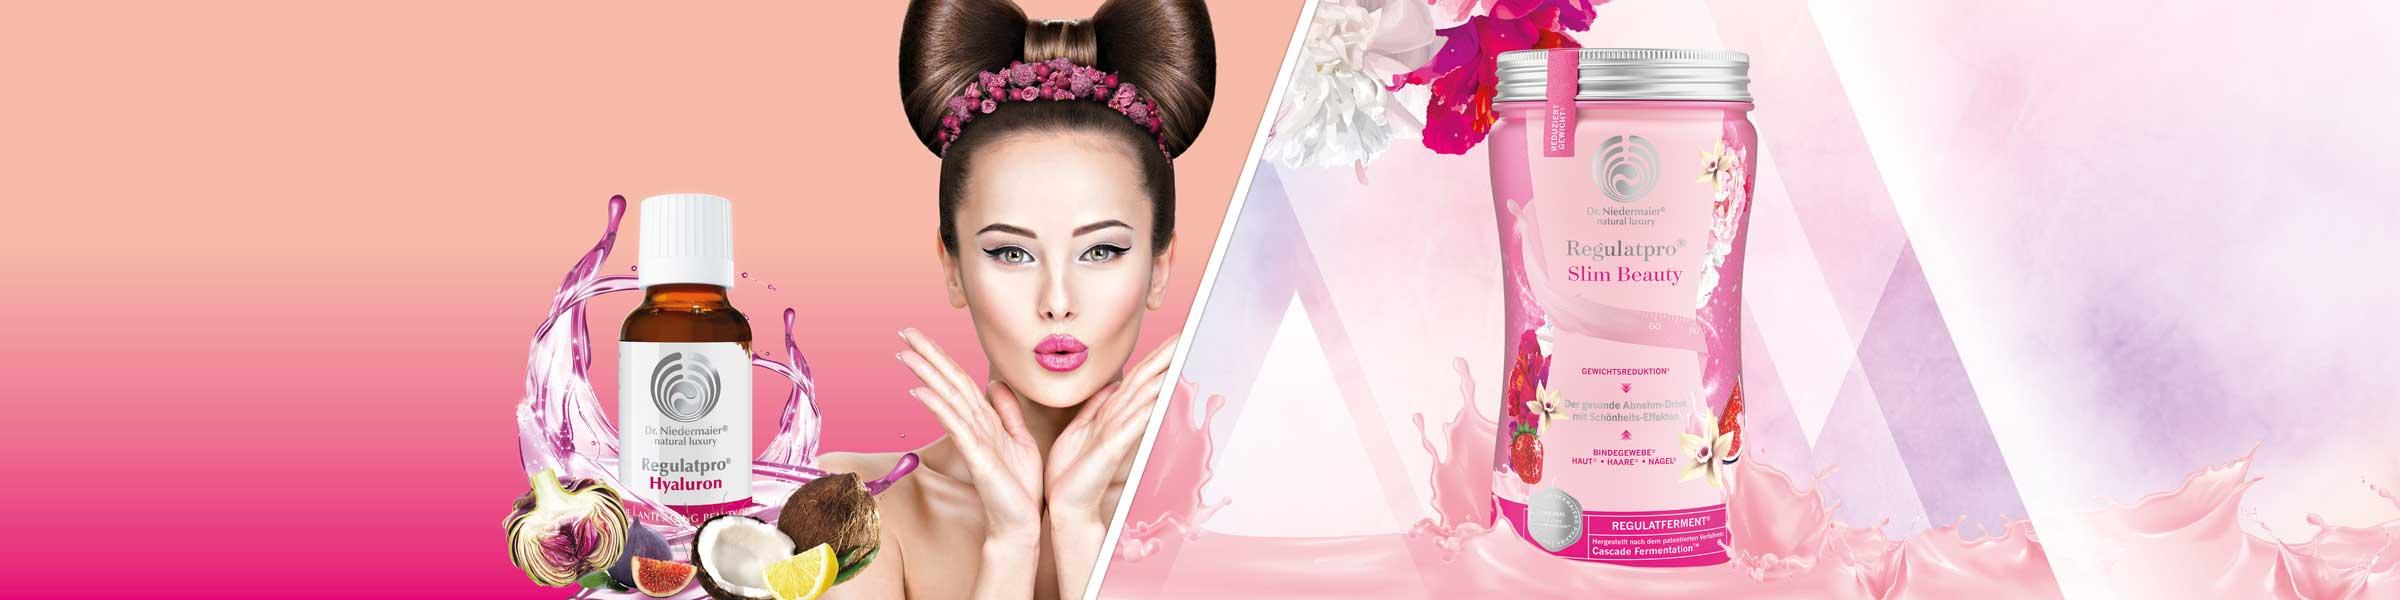 Regulat Beauty natural luxury